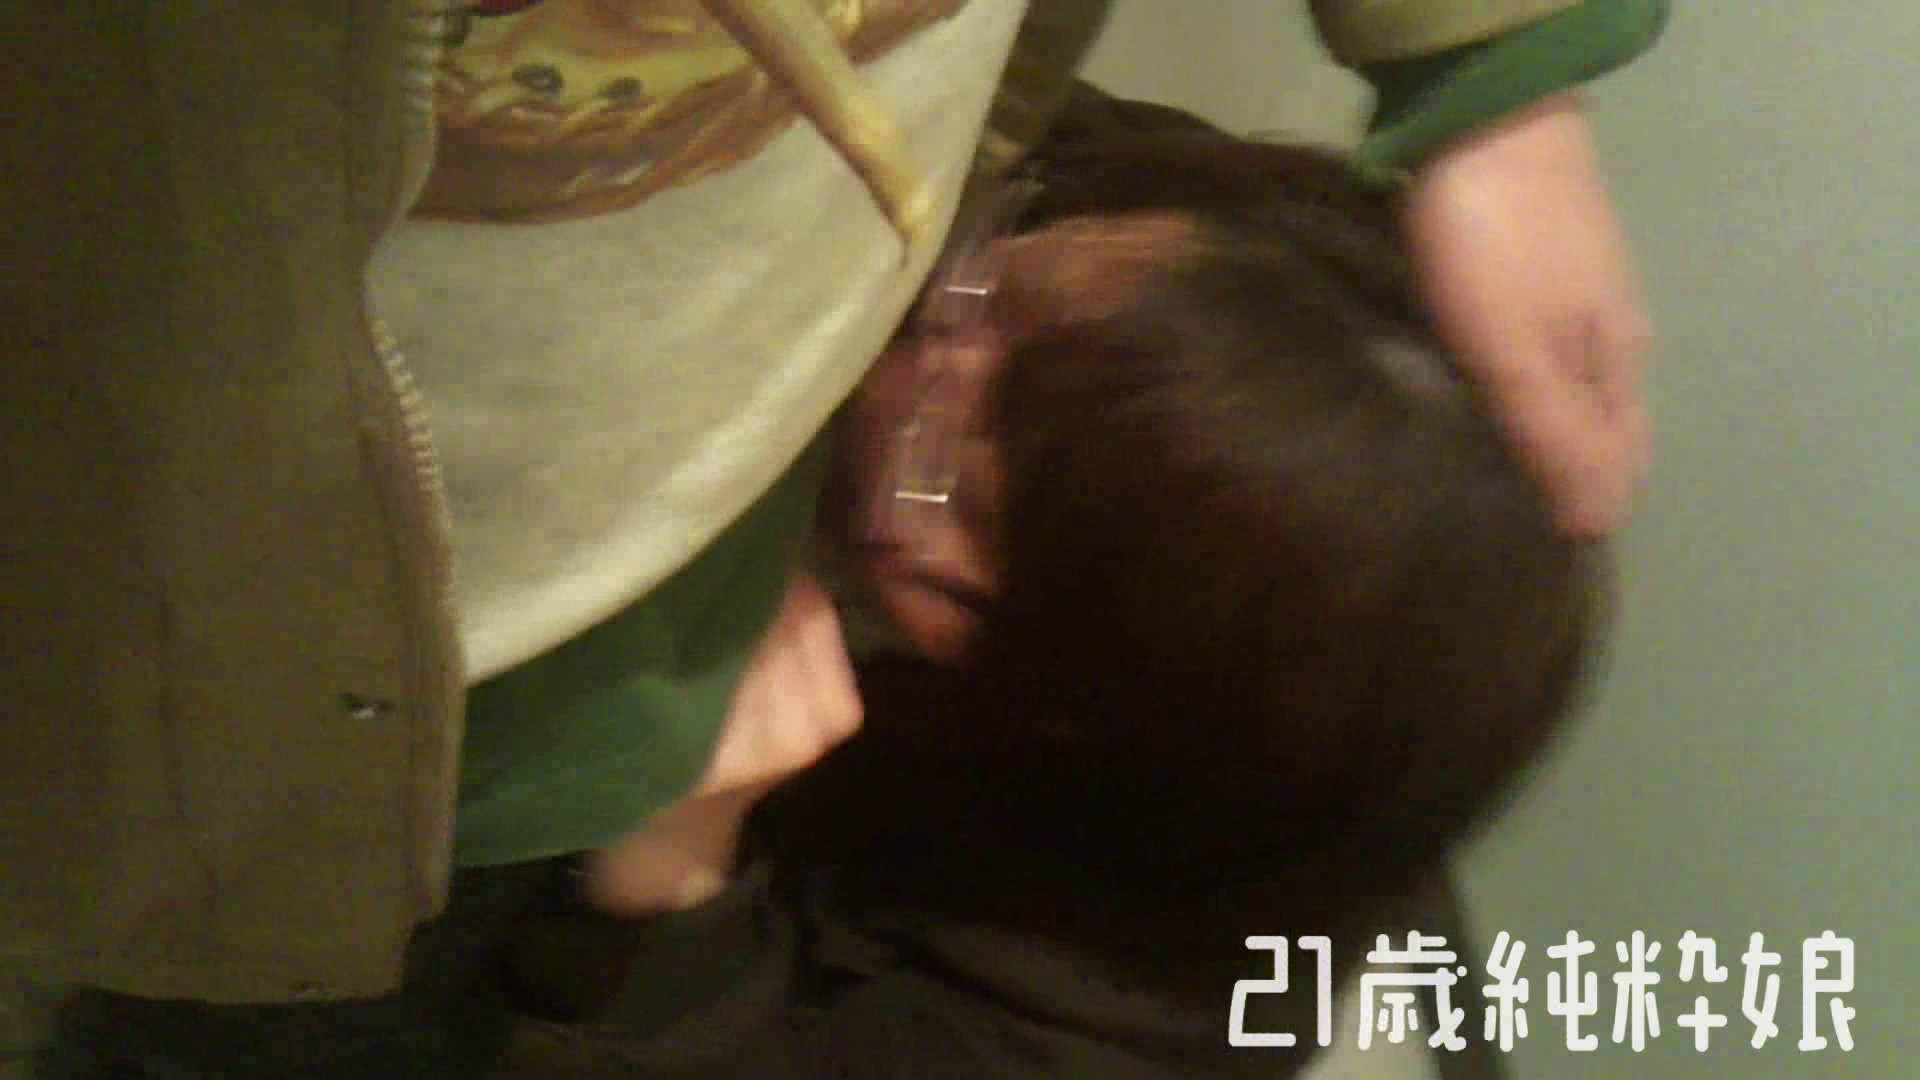 Gカップ21歳純粋嬢第2弾Vol.5 美女OL  78連発 36